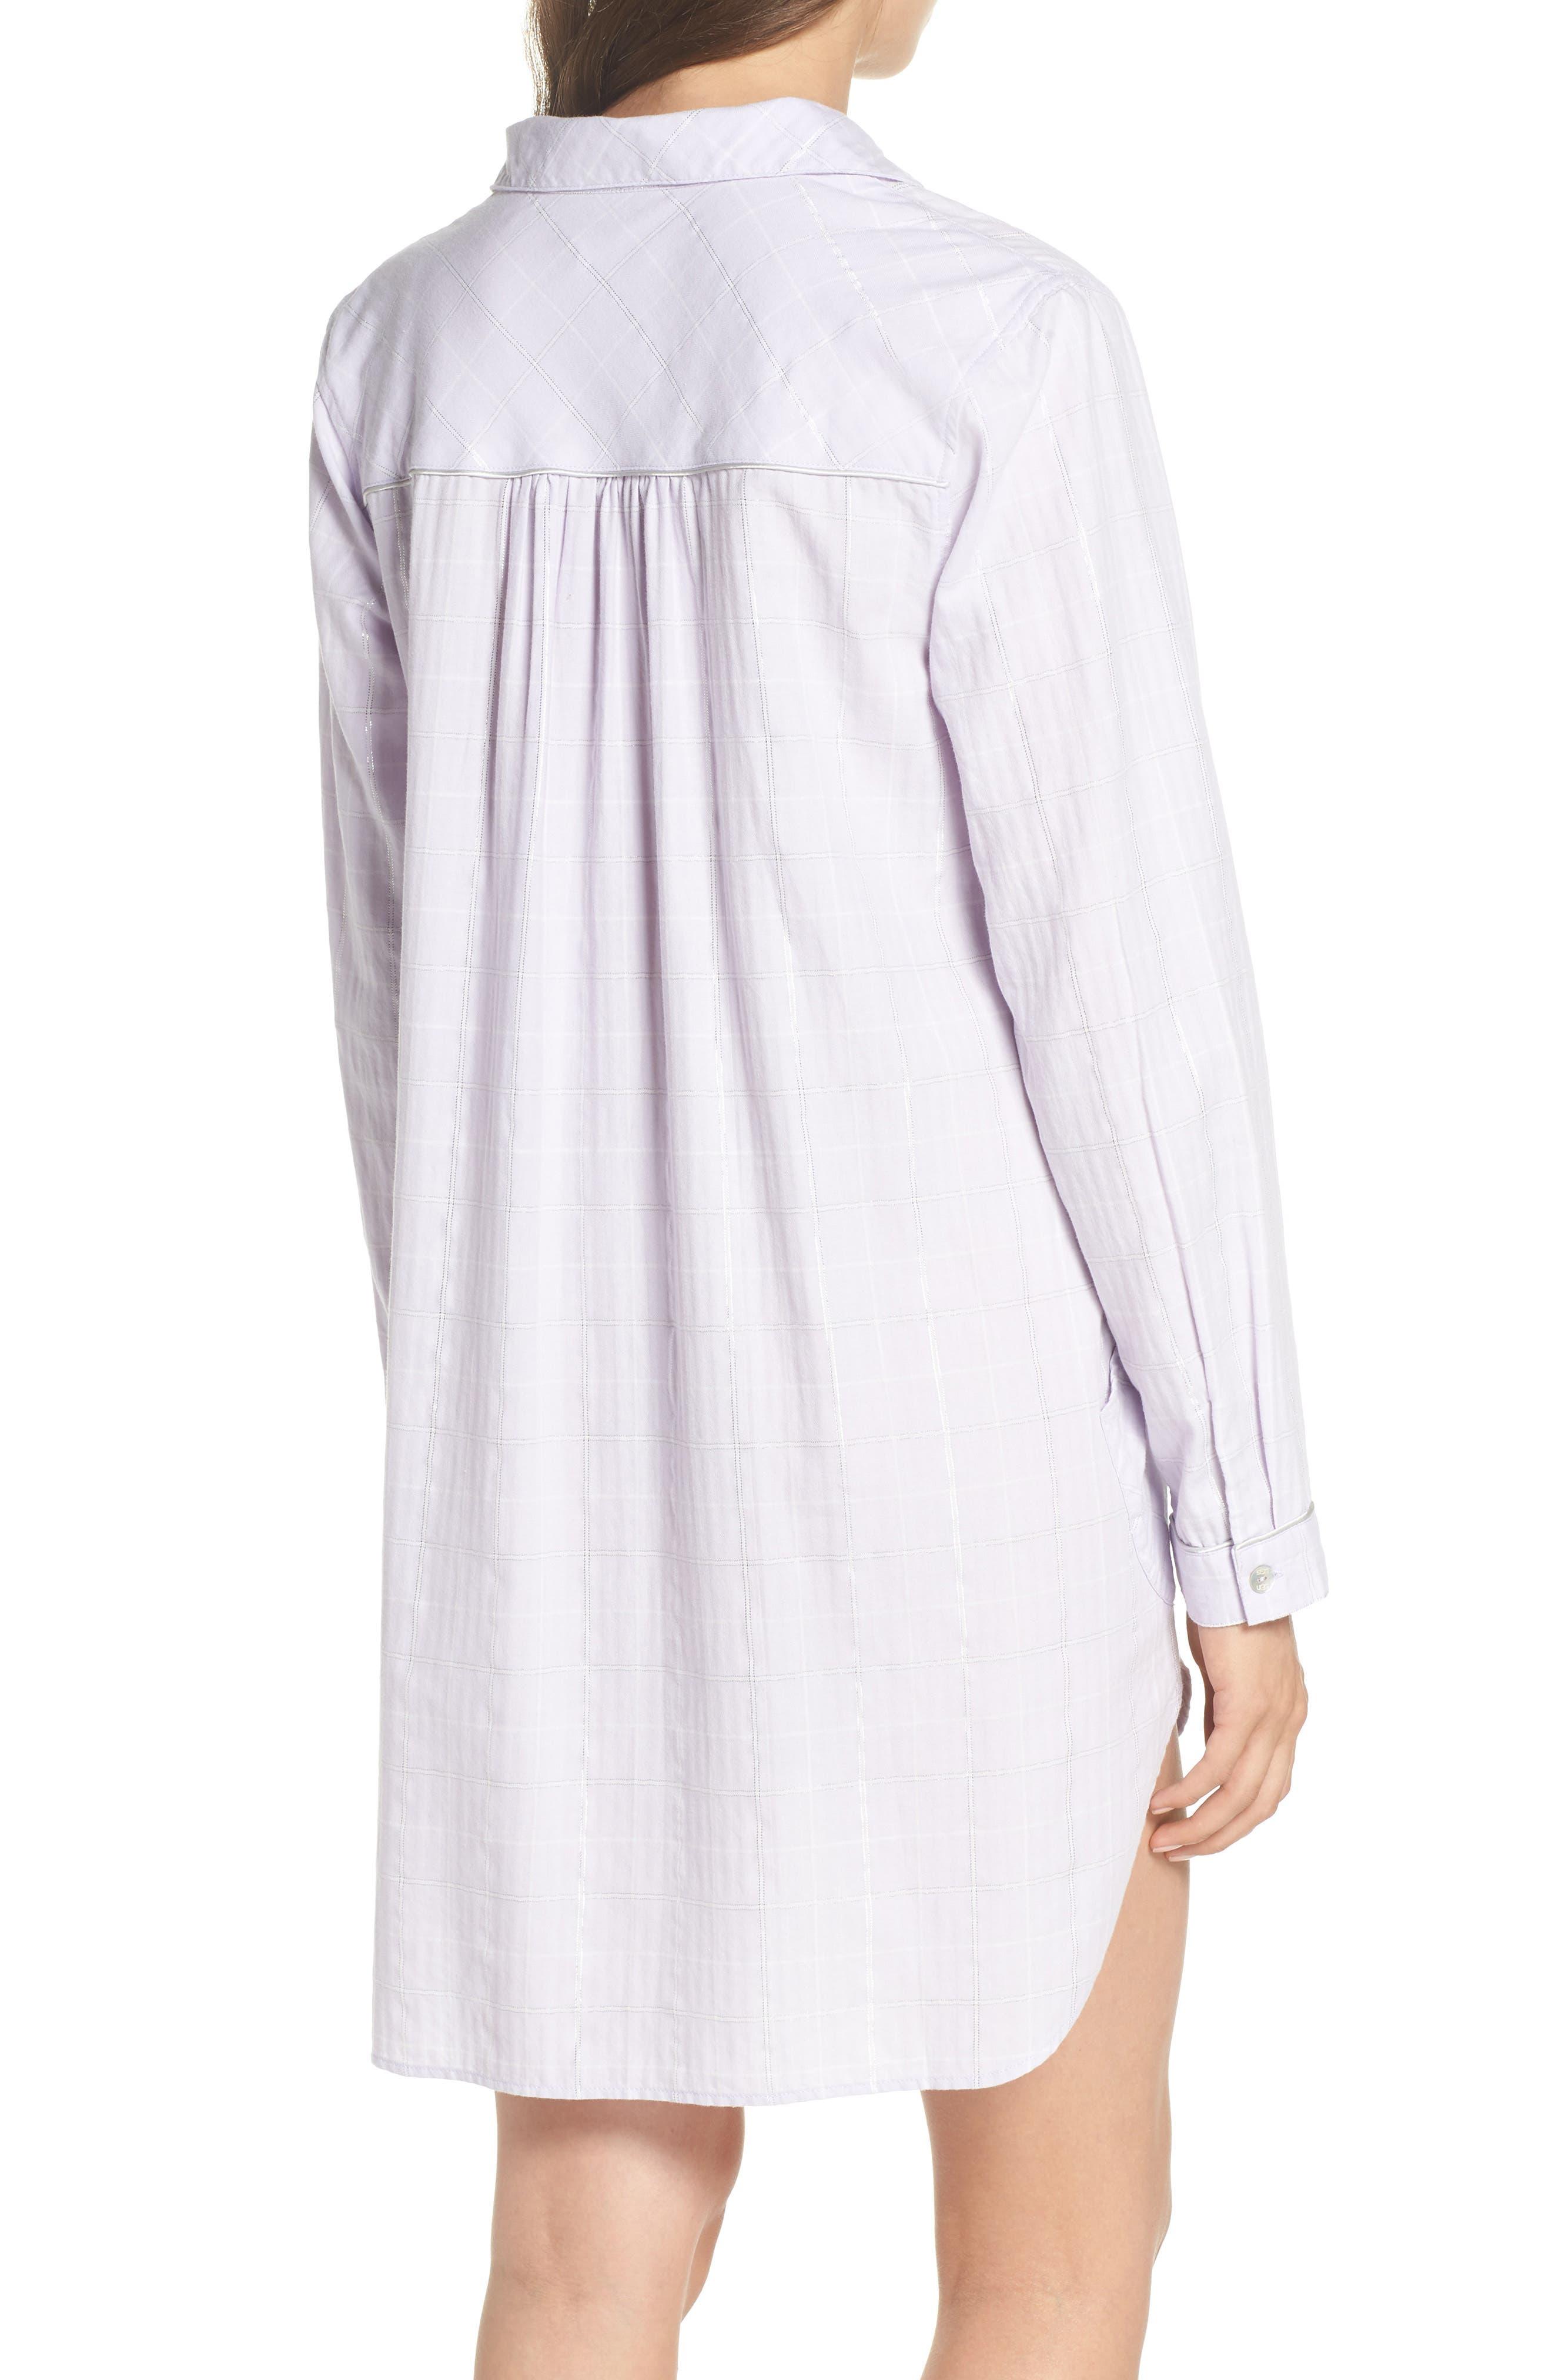 Gabri Sleep Shirt,                             Alternate thumbnail 2, color,                             Lavender Fog